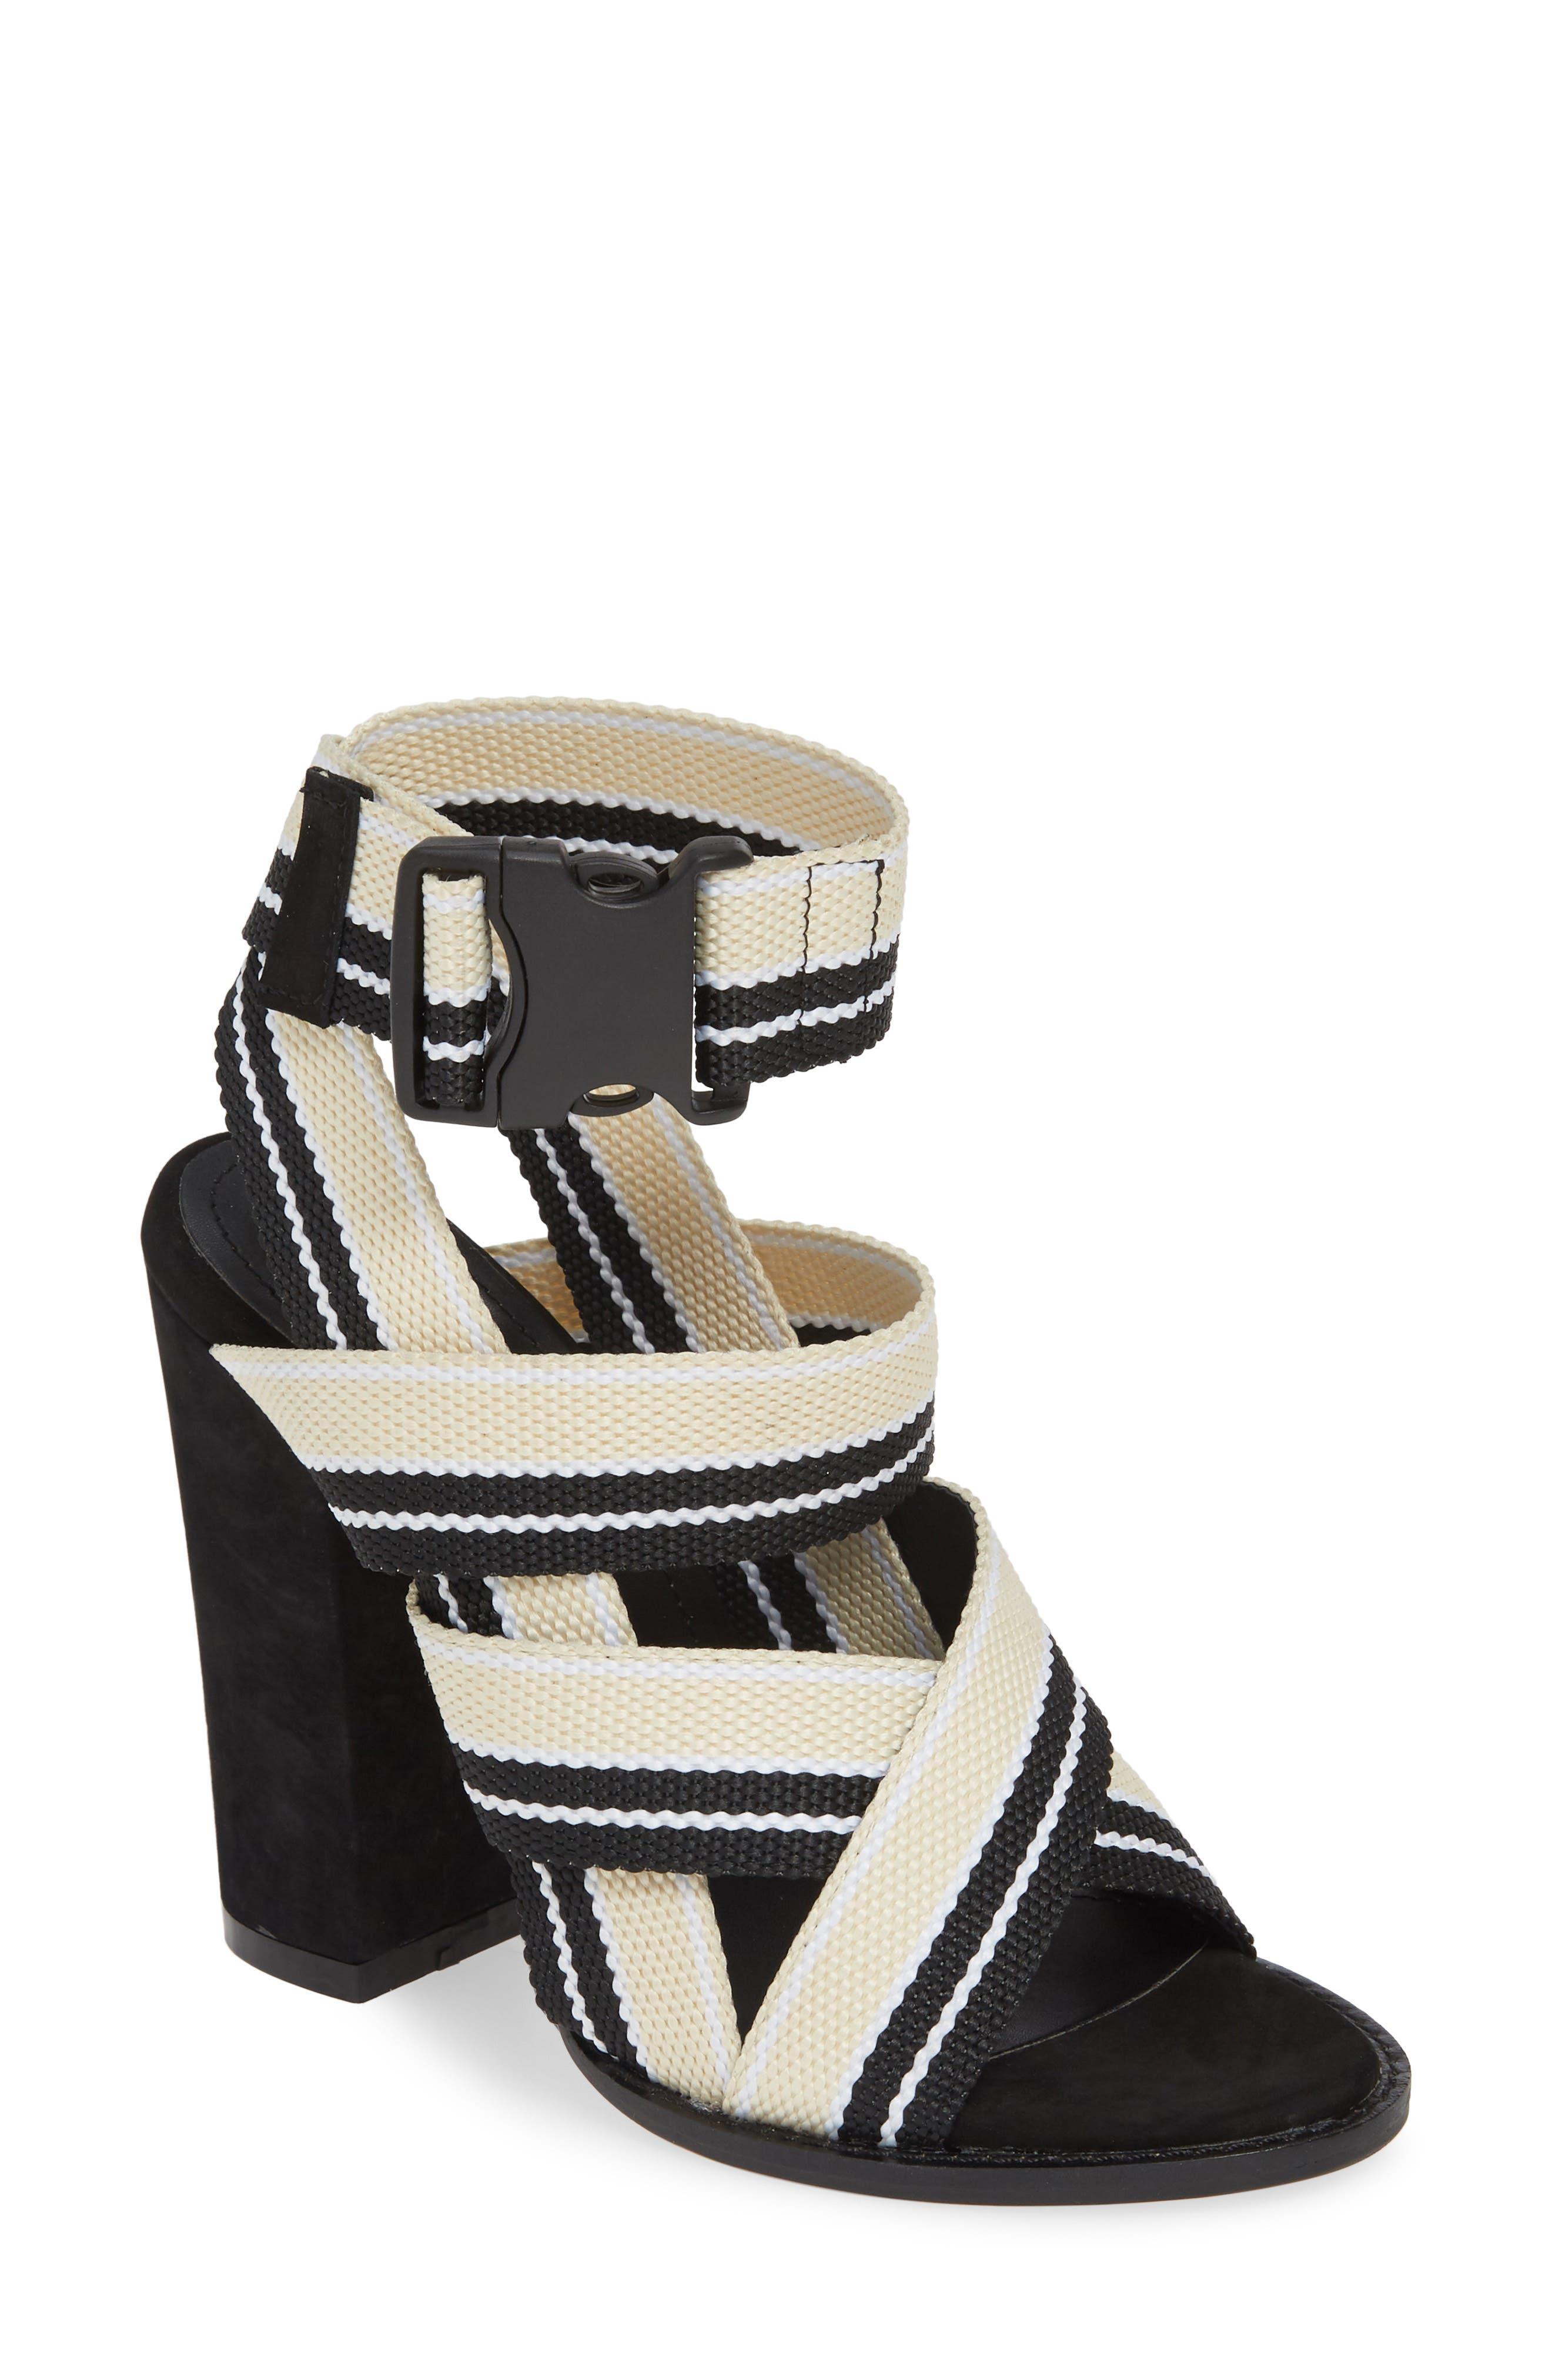 ALIAS MAE Woven Strappy Sandal, Main, color, NUDE/ BLACK FABRIC